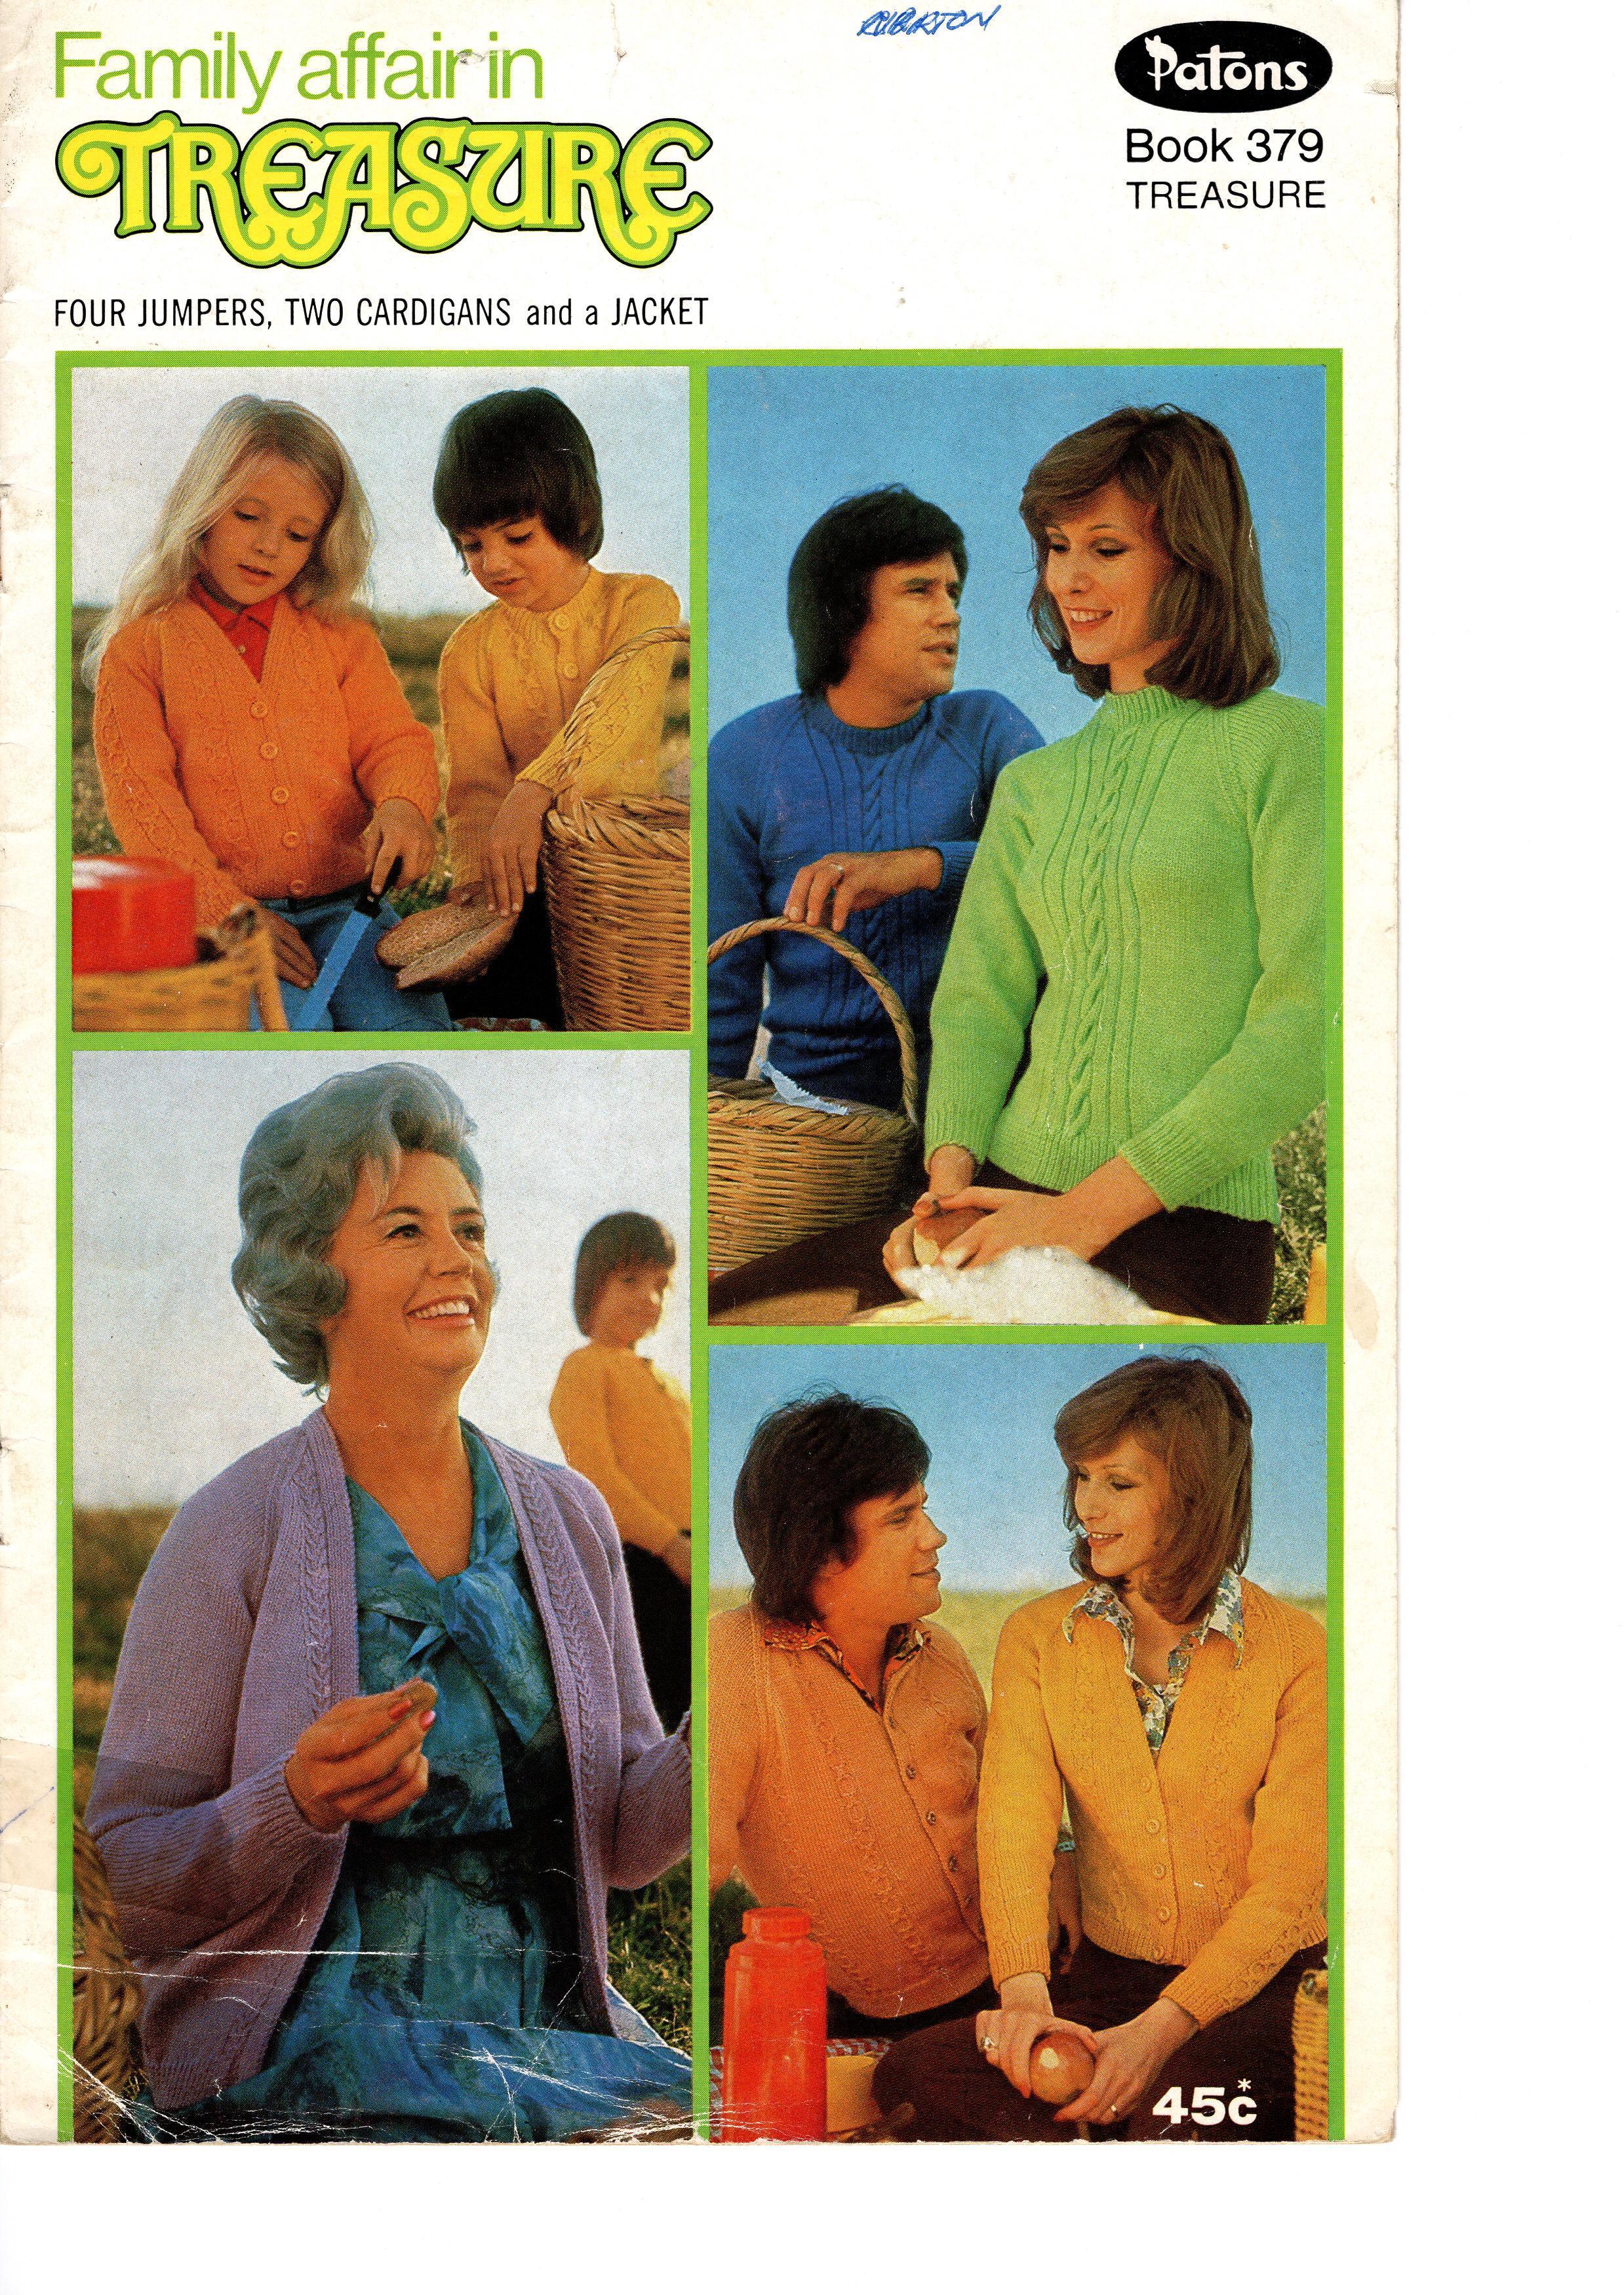 Patons Treasure Knitting Pattern Booklet No.379